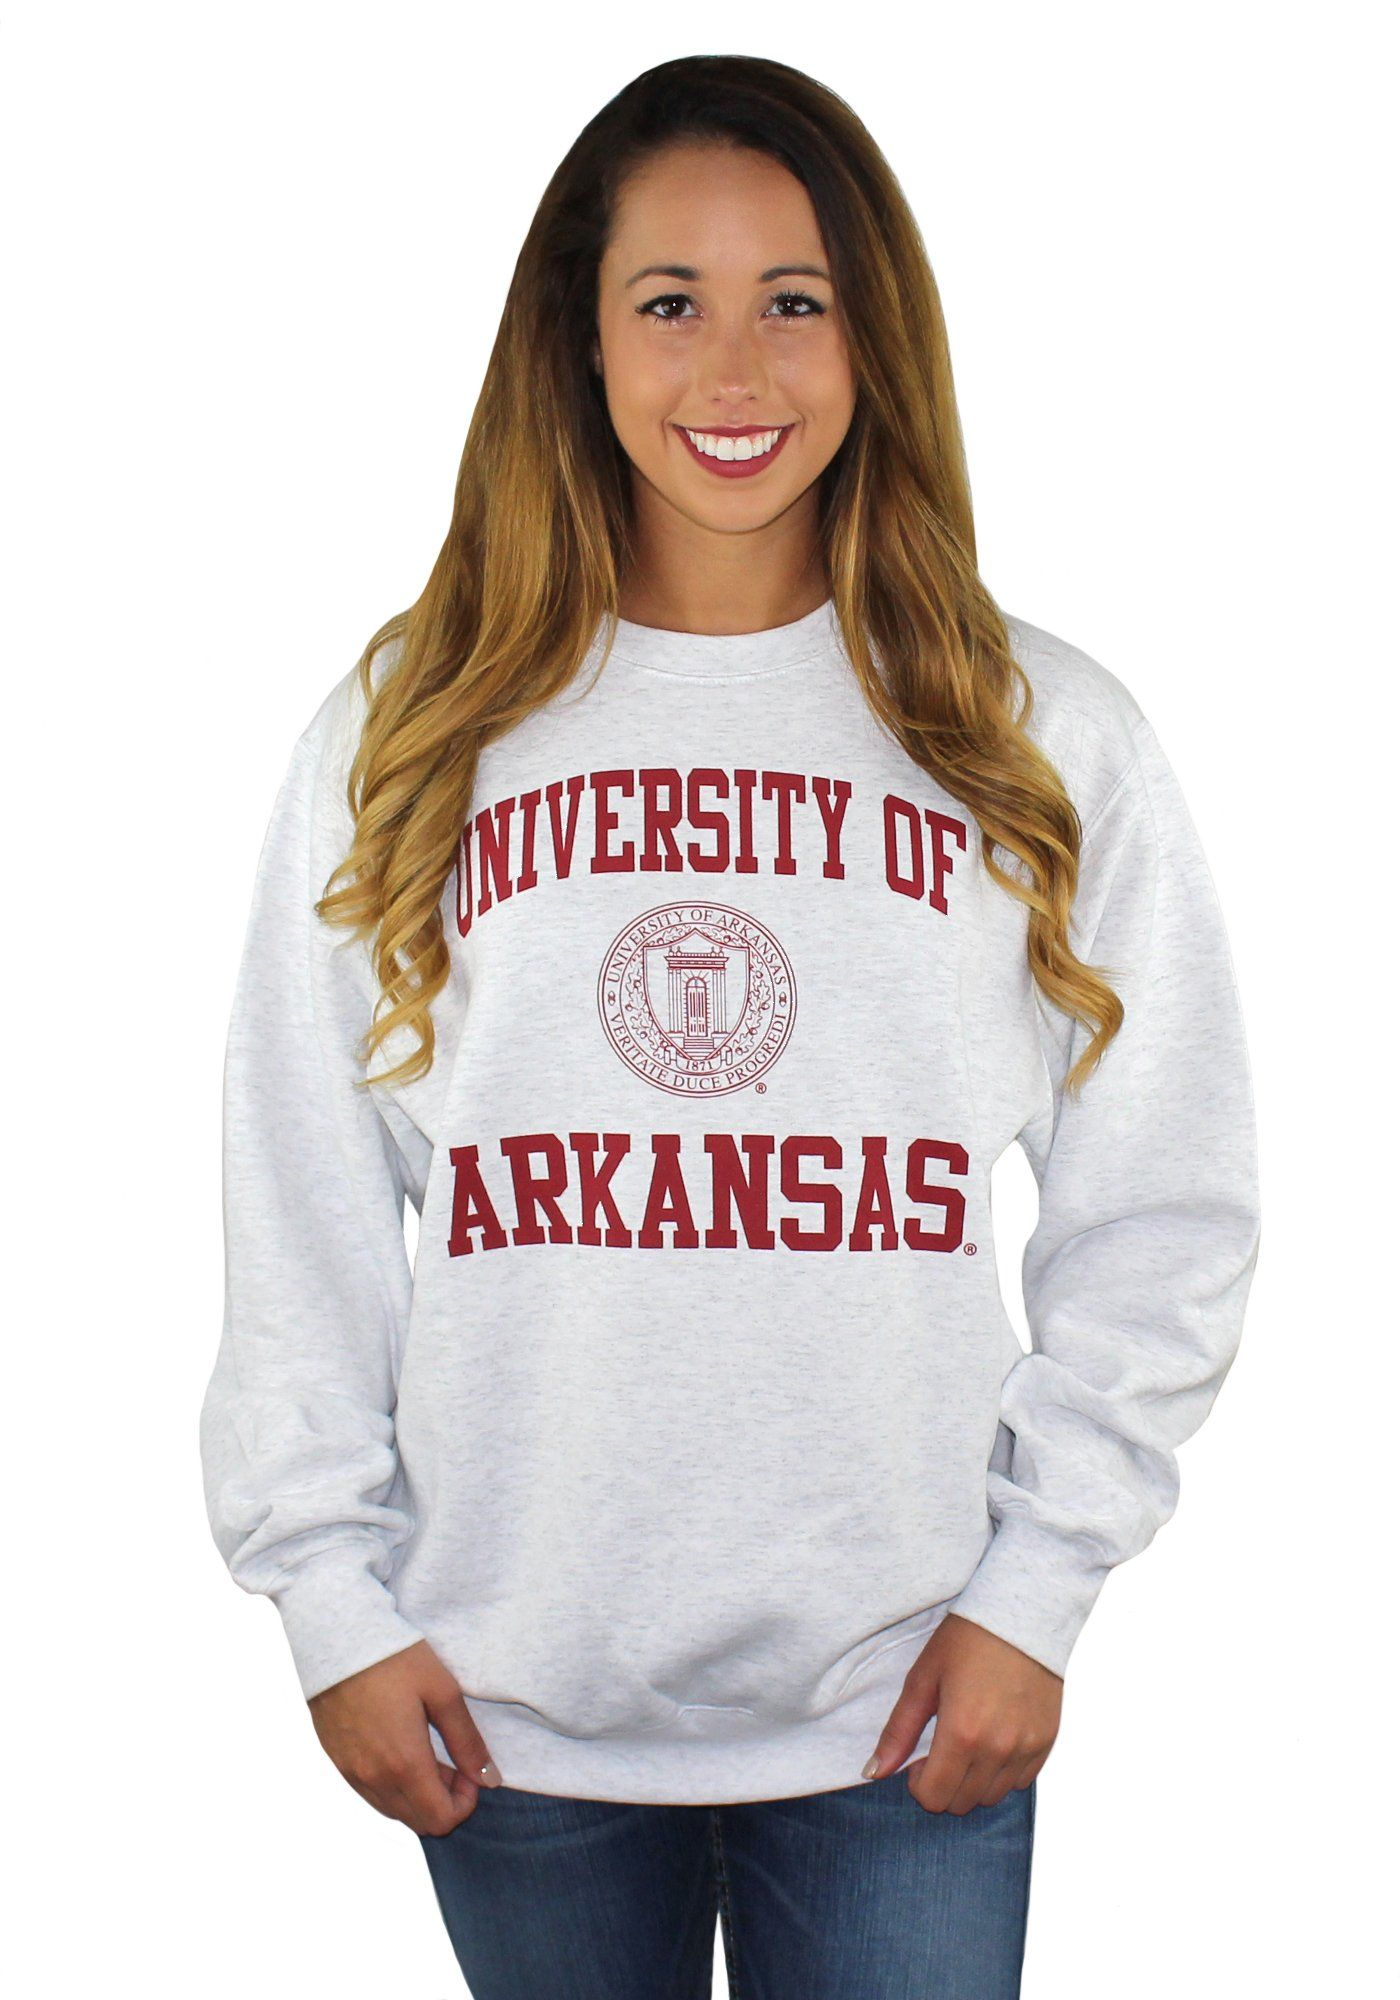 University Of Arkansas Sweatshirt Sweatshirts College Hoodies Sweatshirts Women [ 2000 x 1400 Pixel ]